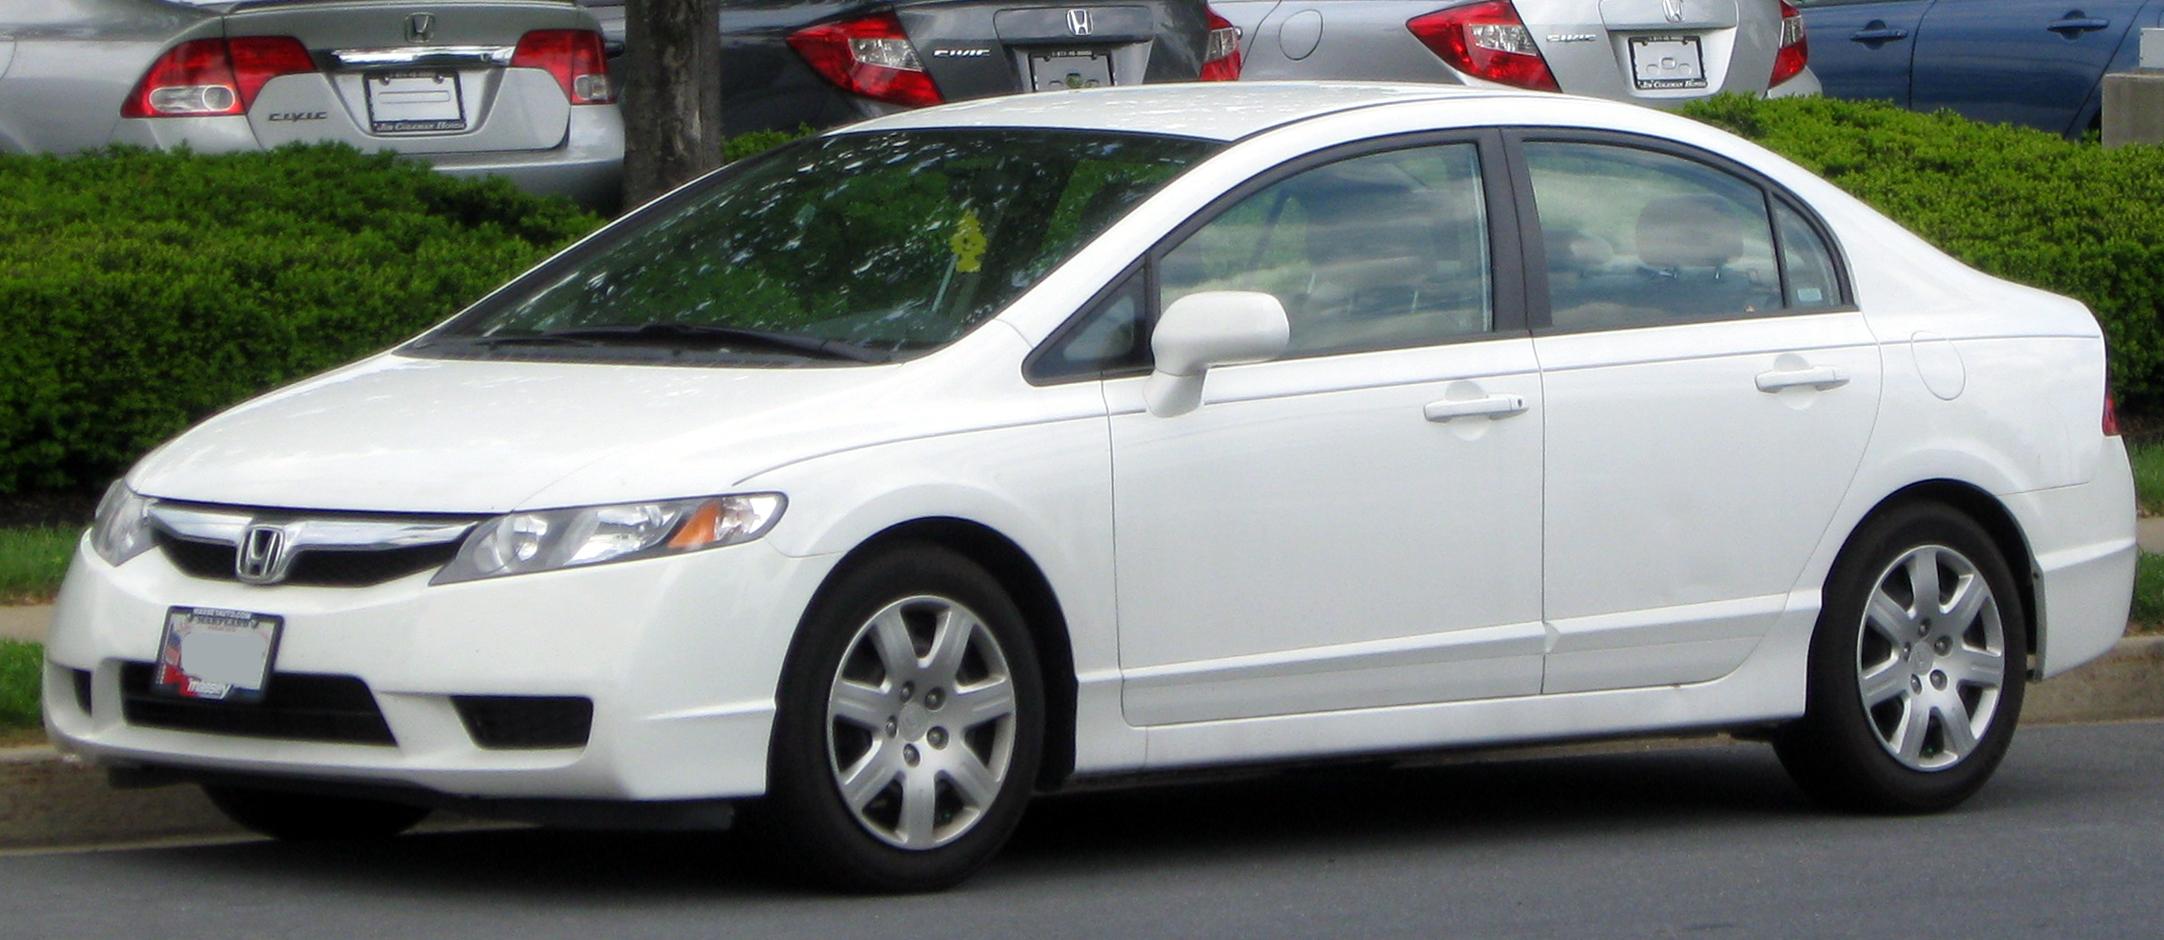 2011 HONDA CIVIC - Image #15